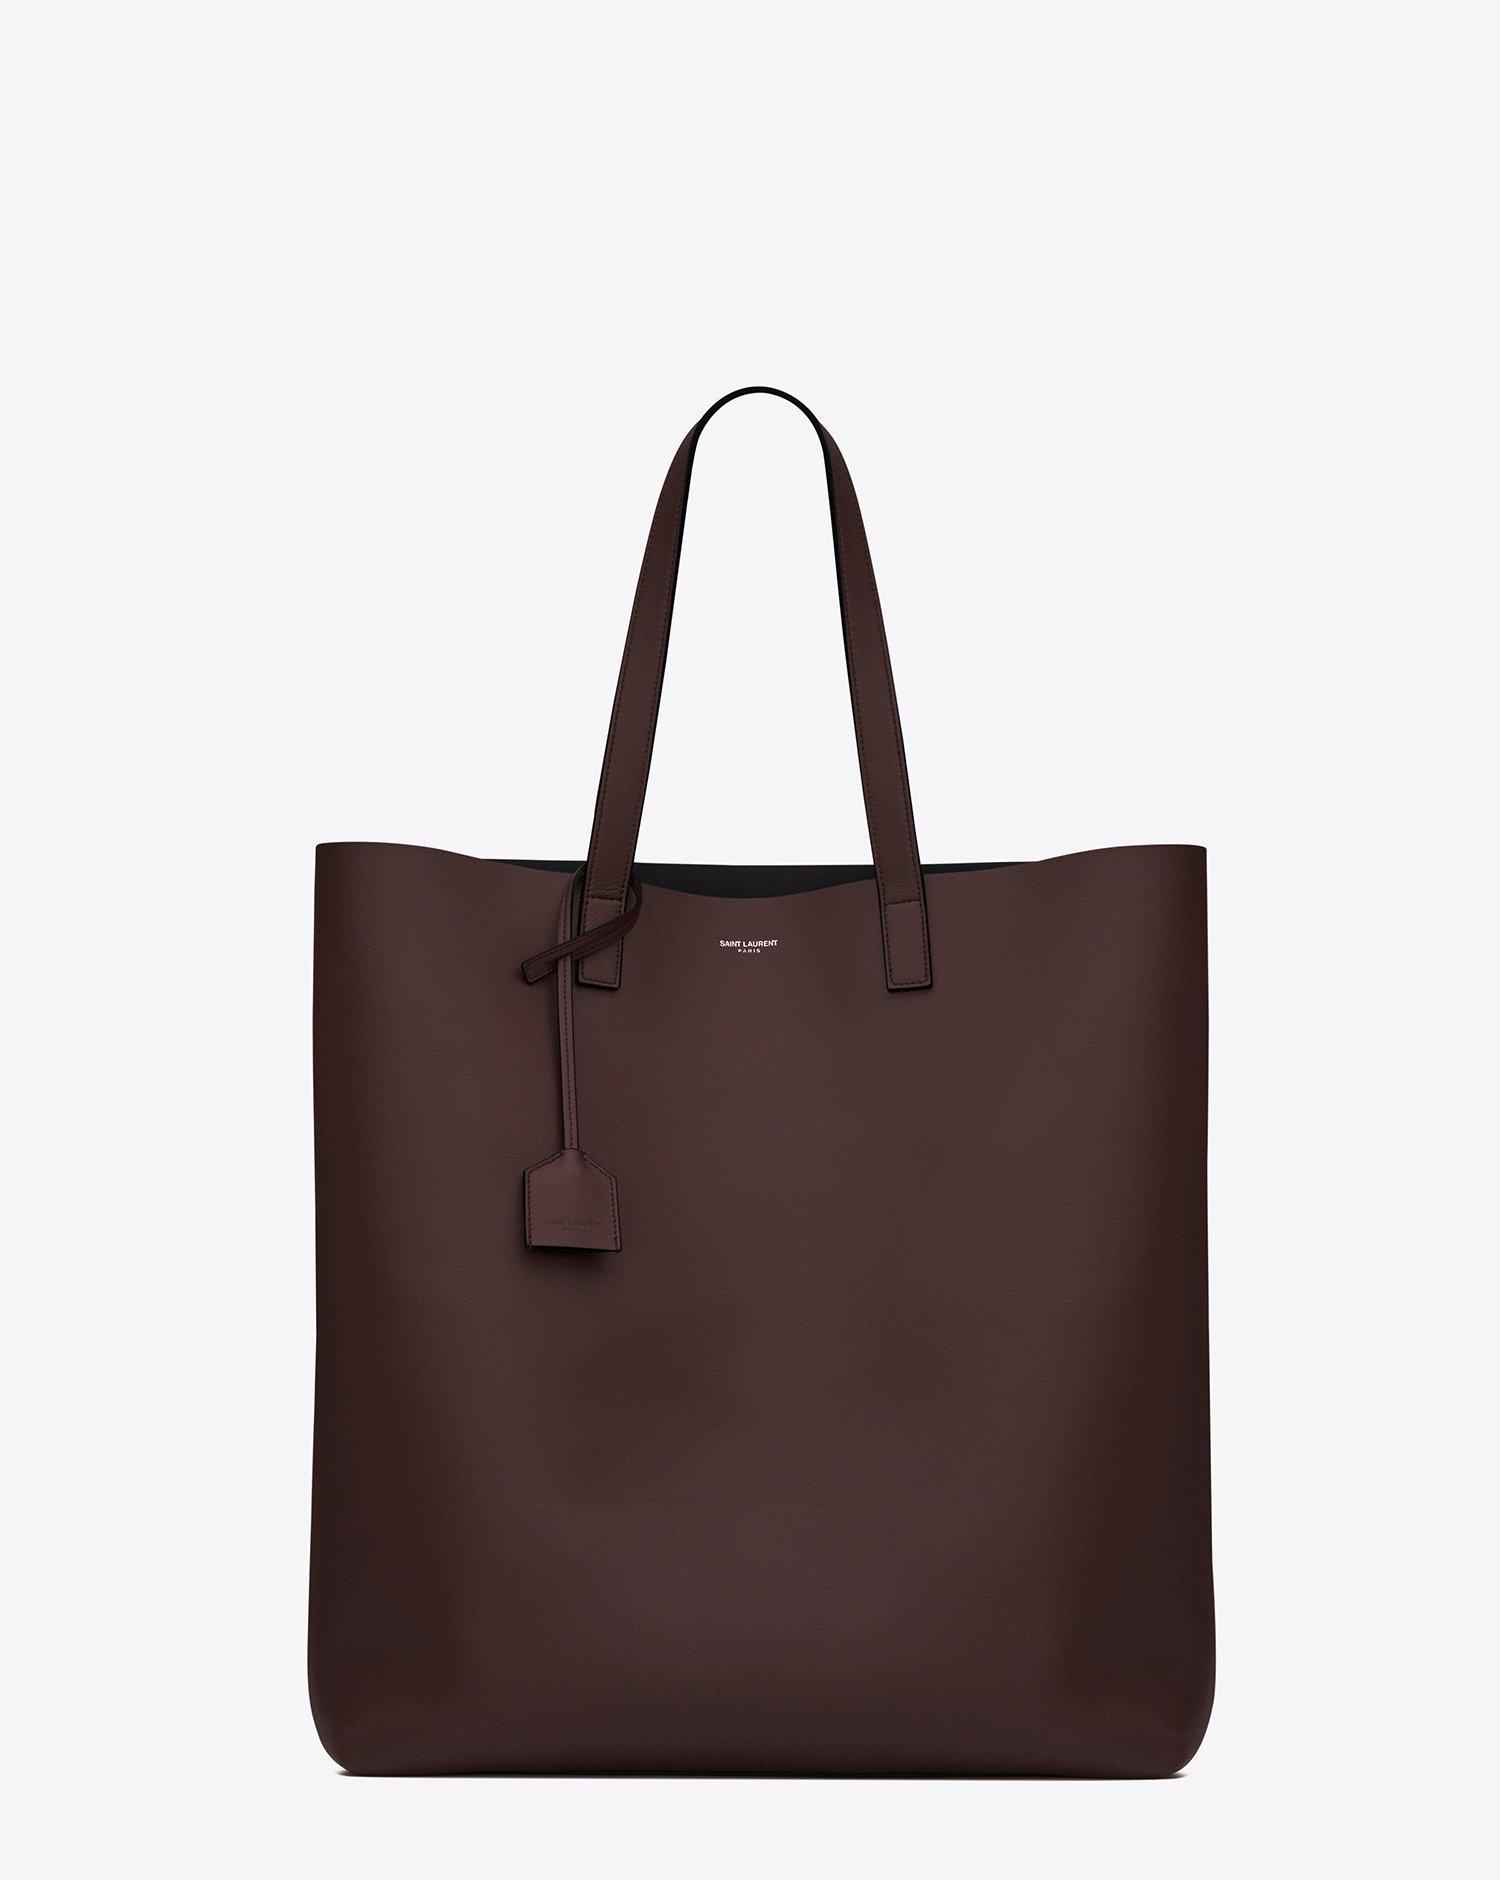 saint laurent shopping tote bag in bordeaux and black. Black Bedroom Furniture Sets. Home Design Ideas